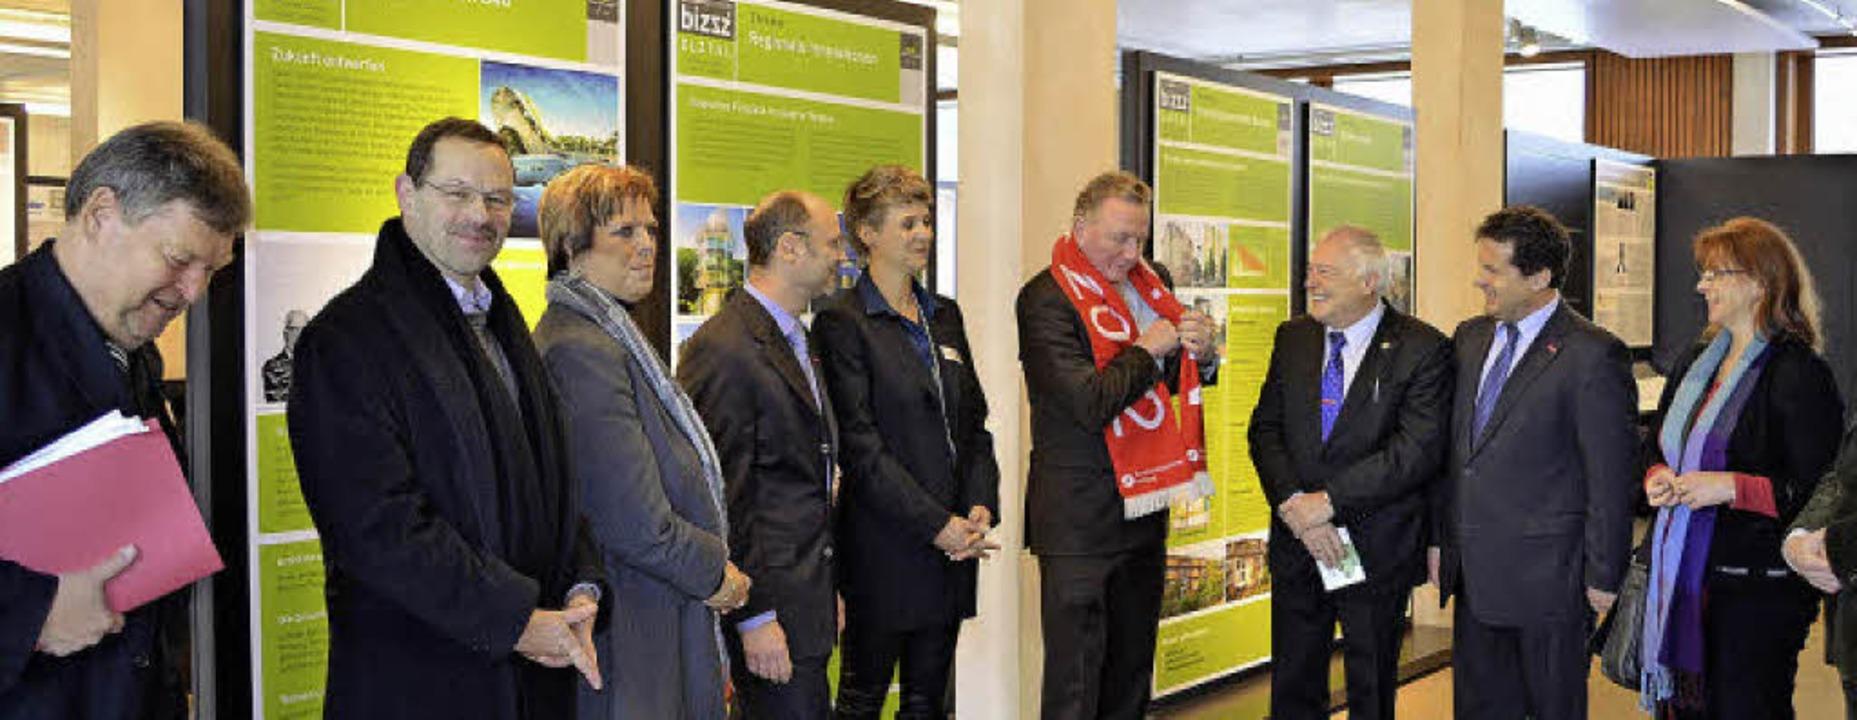 Begrüßung im Bizzz: Oberbürgermeister ...nes Burger, Gabi Rolland (MdL) (v.li.)  | Foto: Nikolaus Bayer